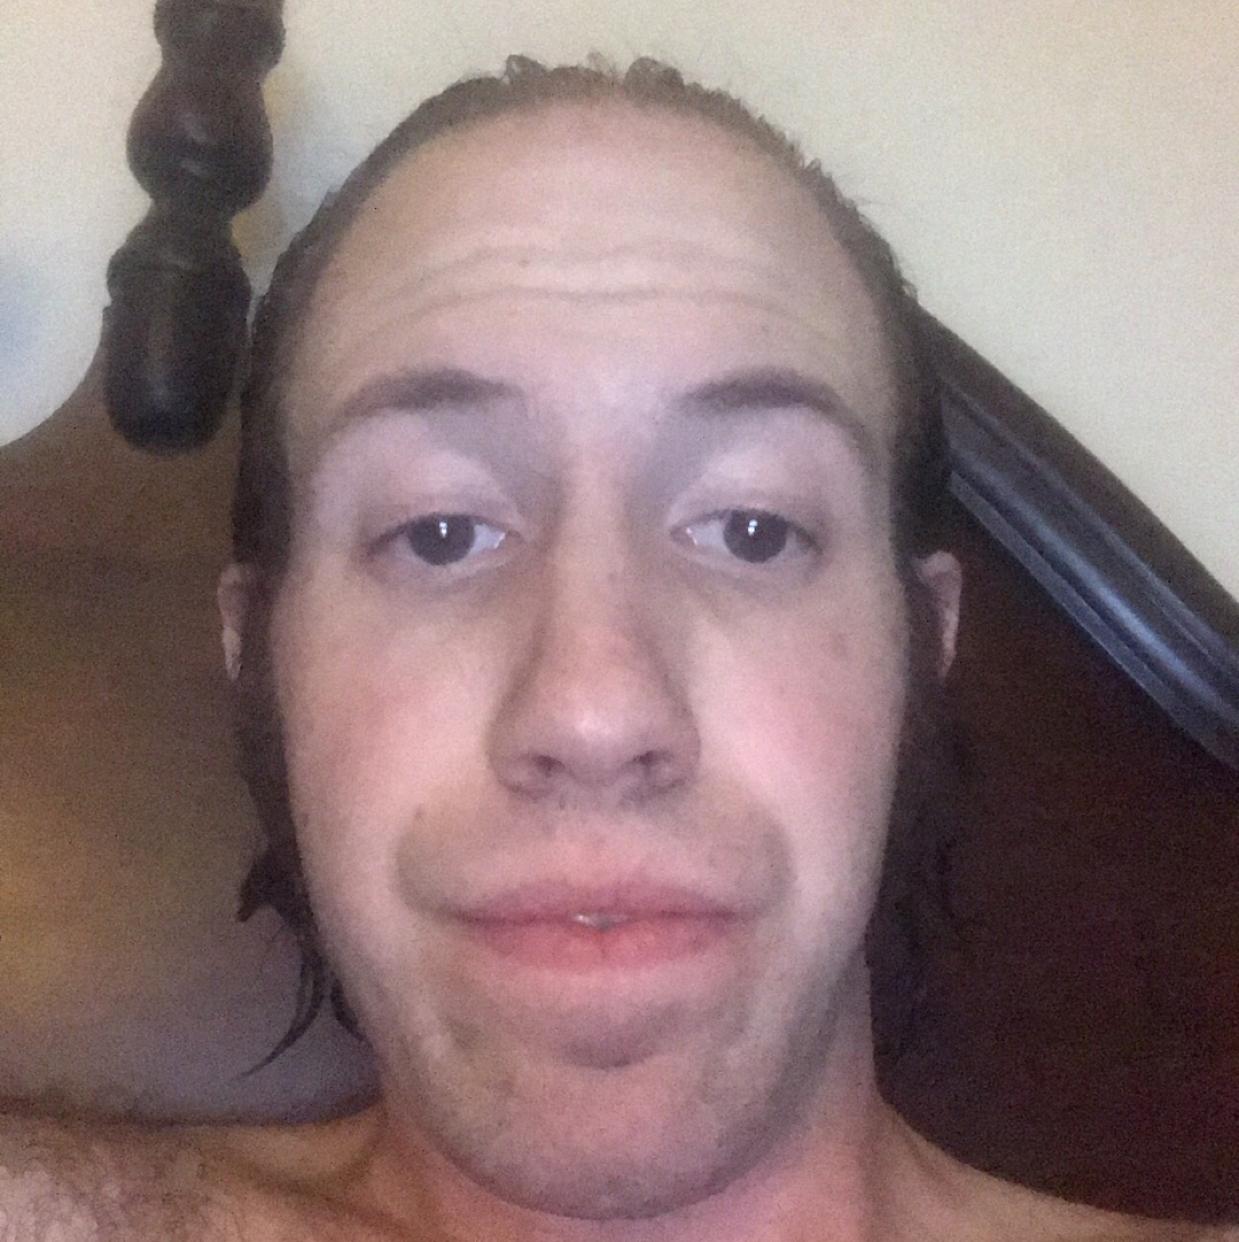 Video Call with joneagle